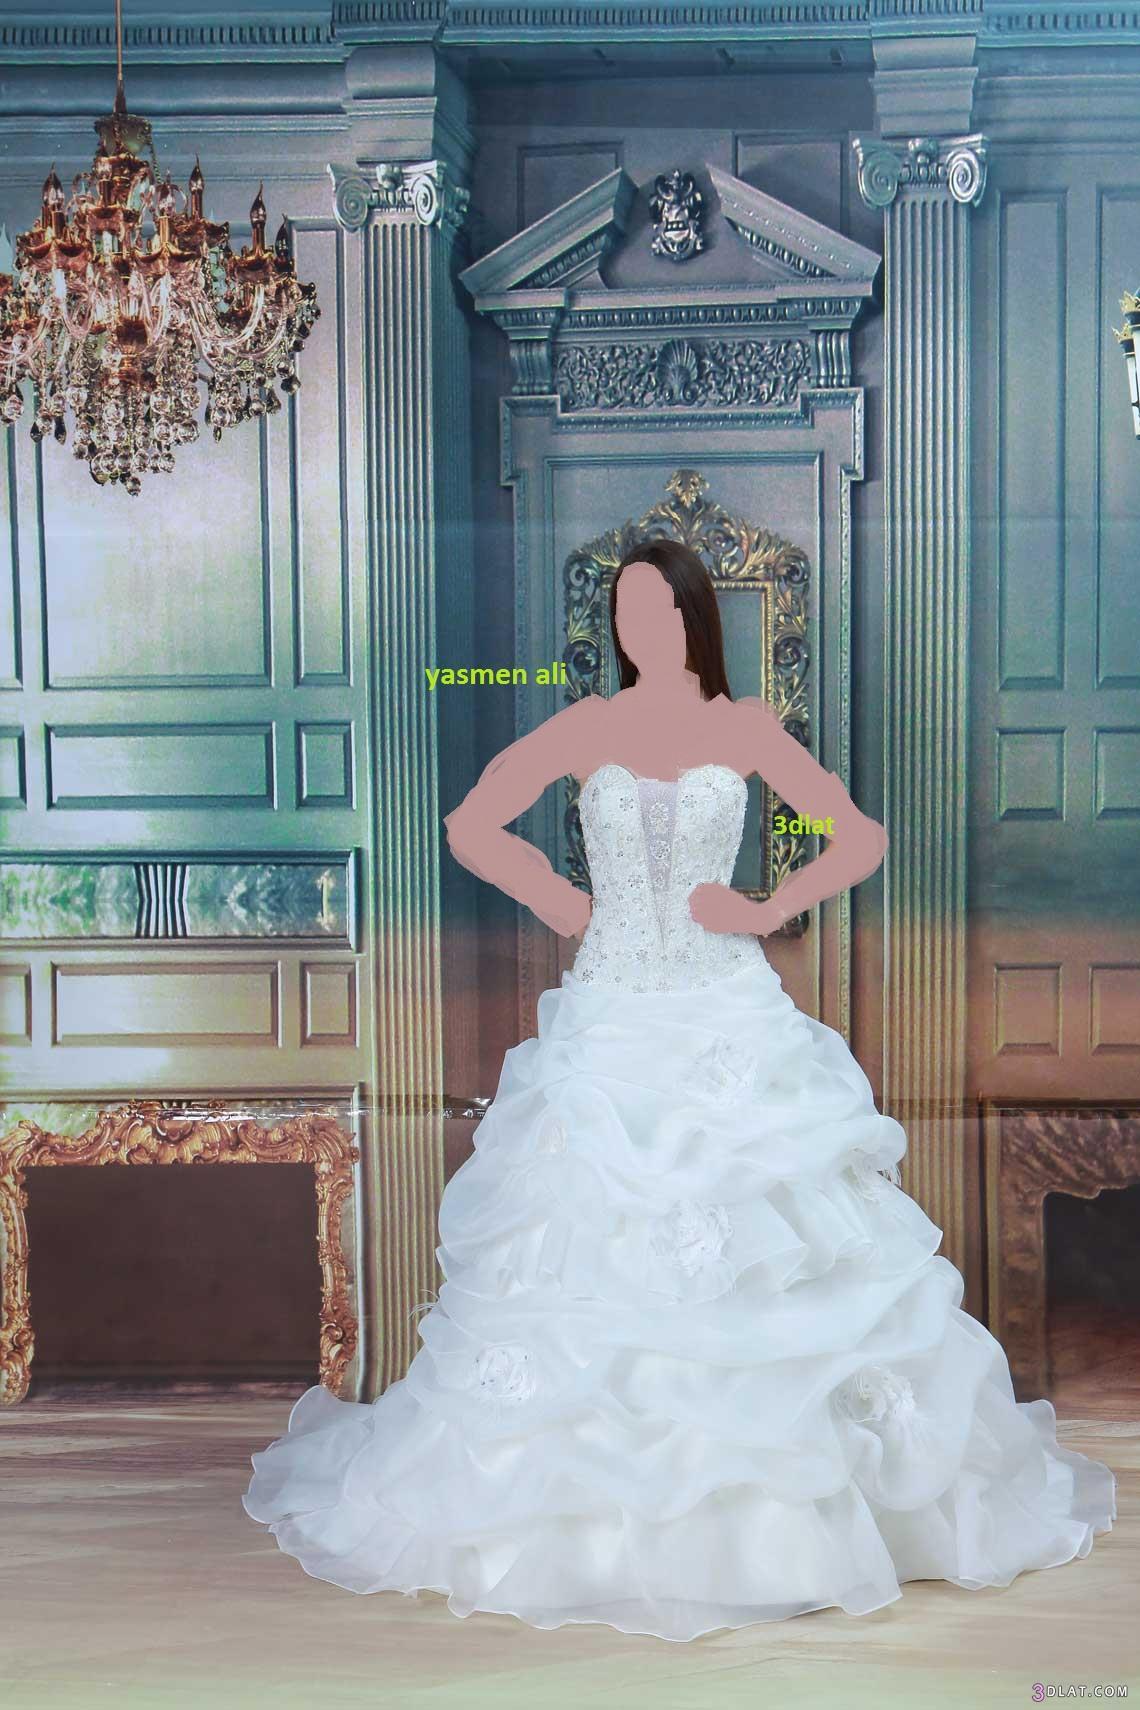 صور فساتين زفاف 2014 احدث فساتين الزفاف 2014 3dlat.com_14018030699